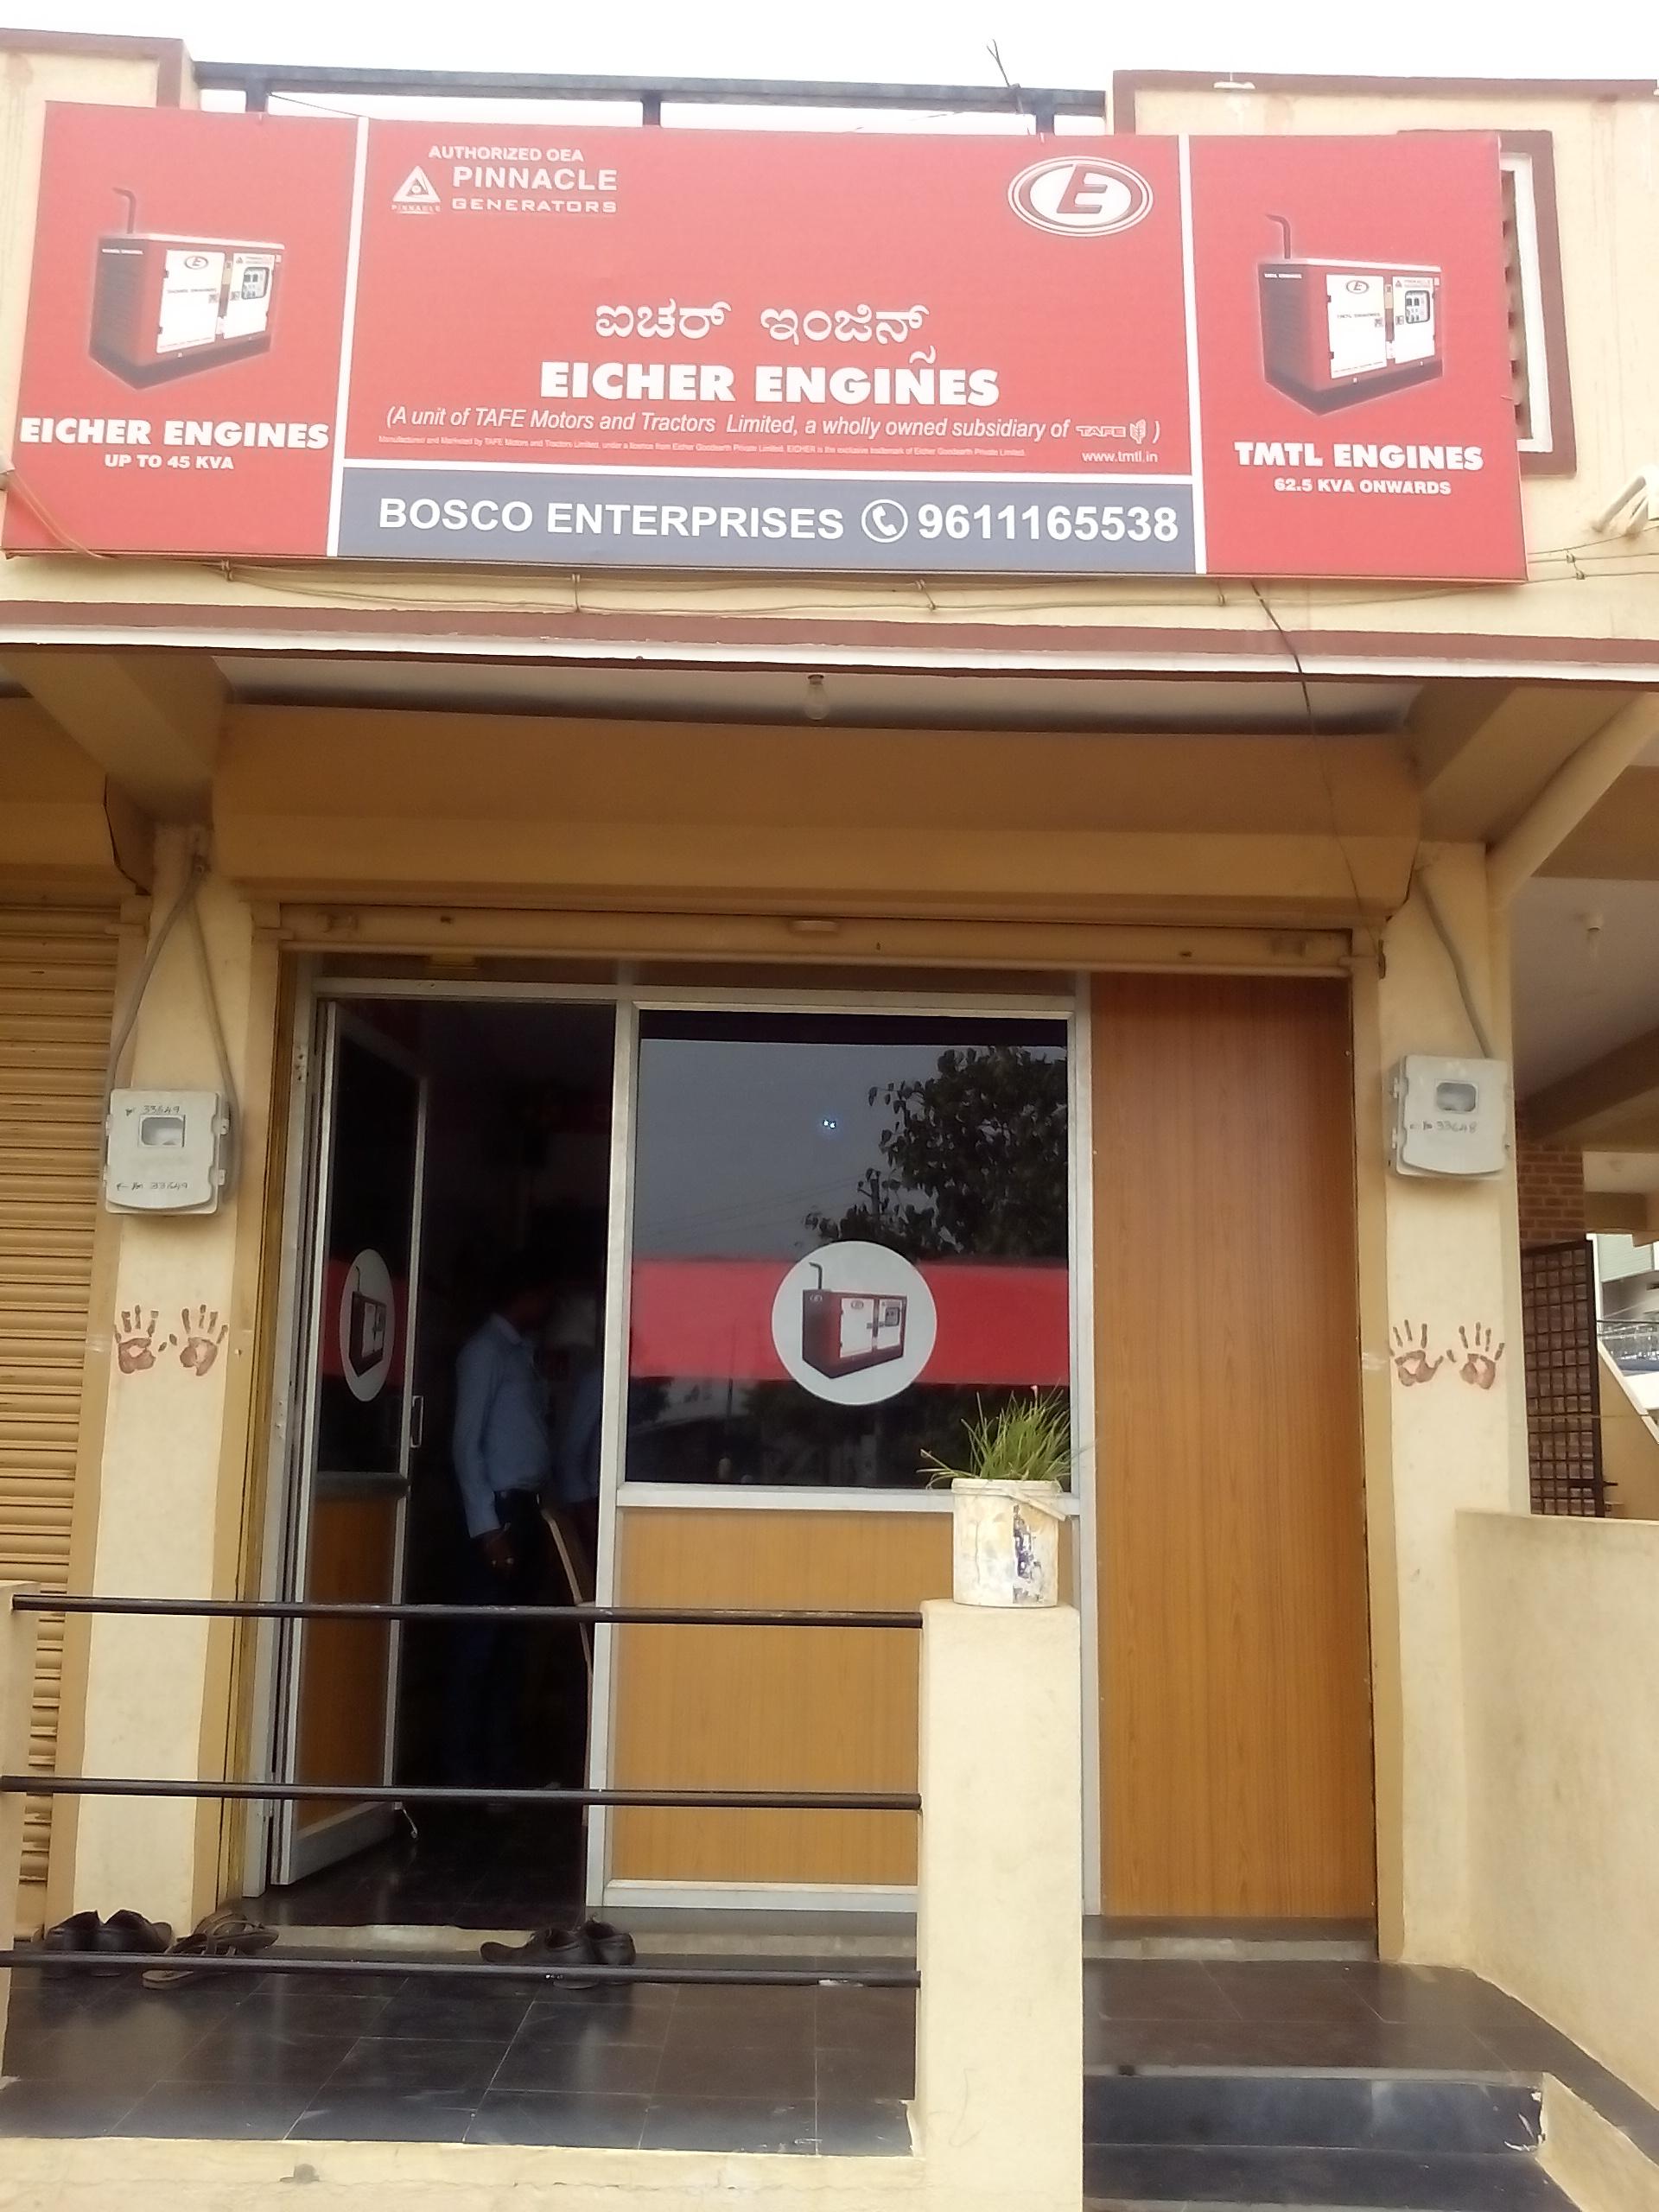 Bosco Enterprises